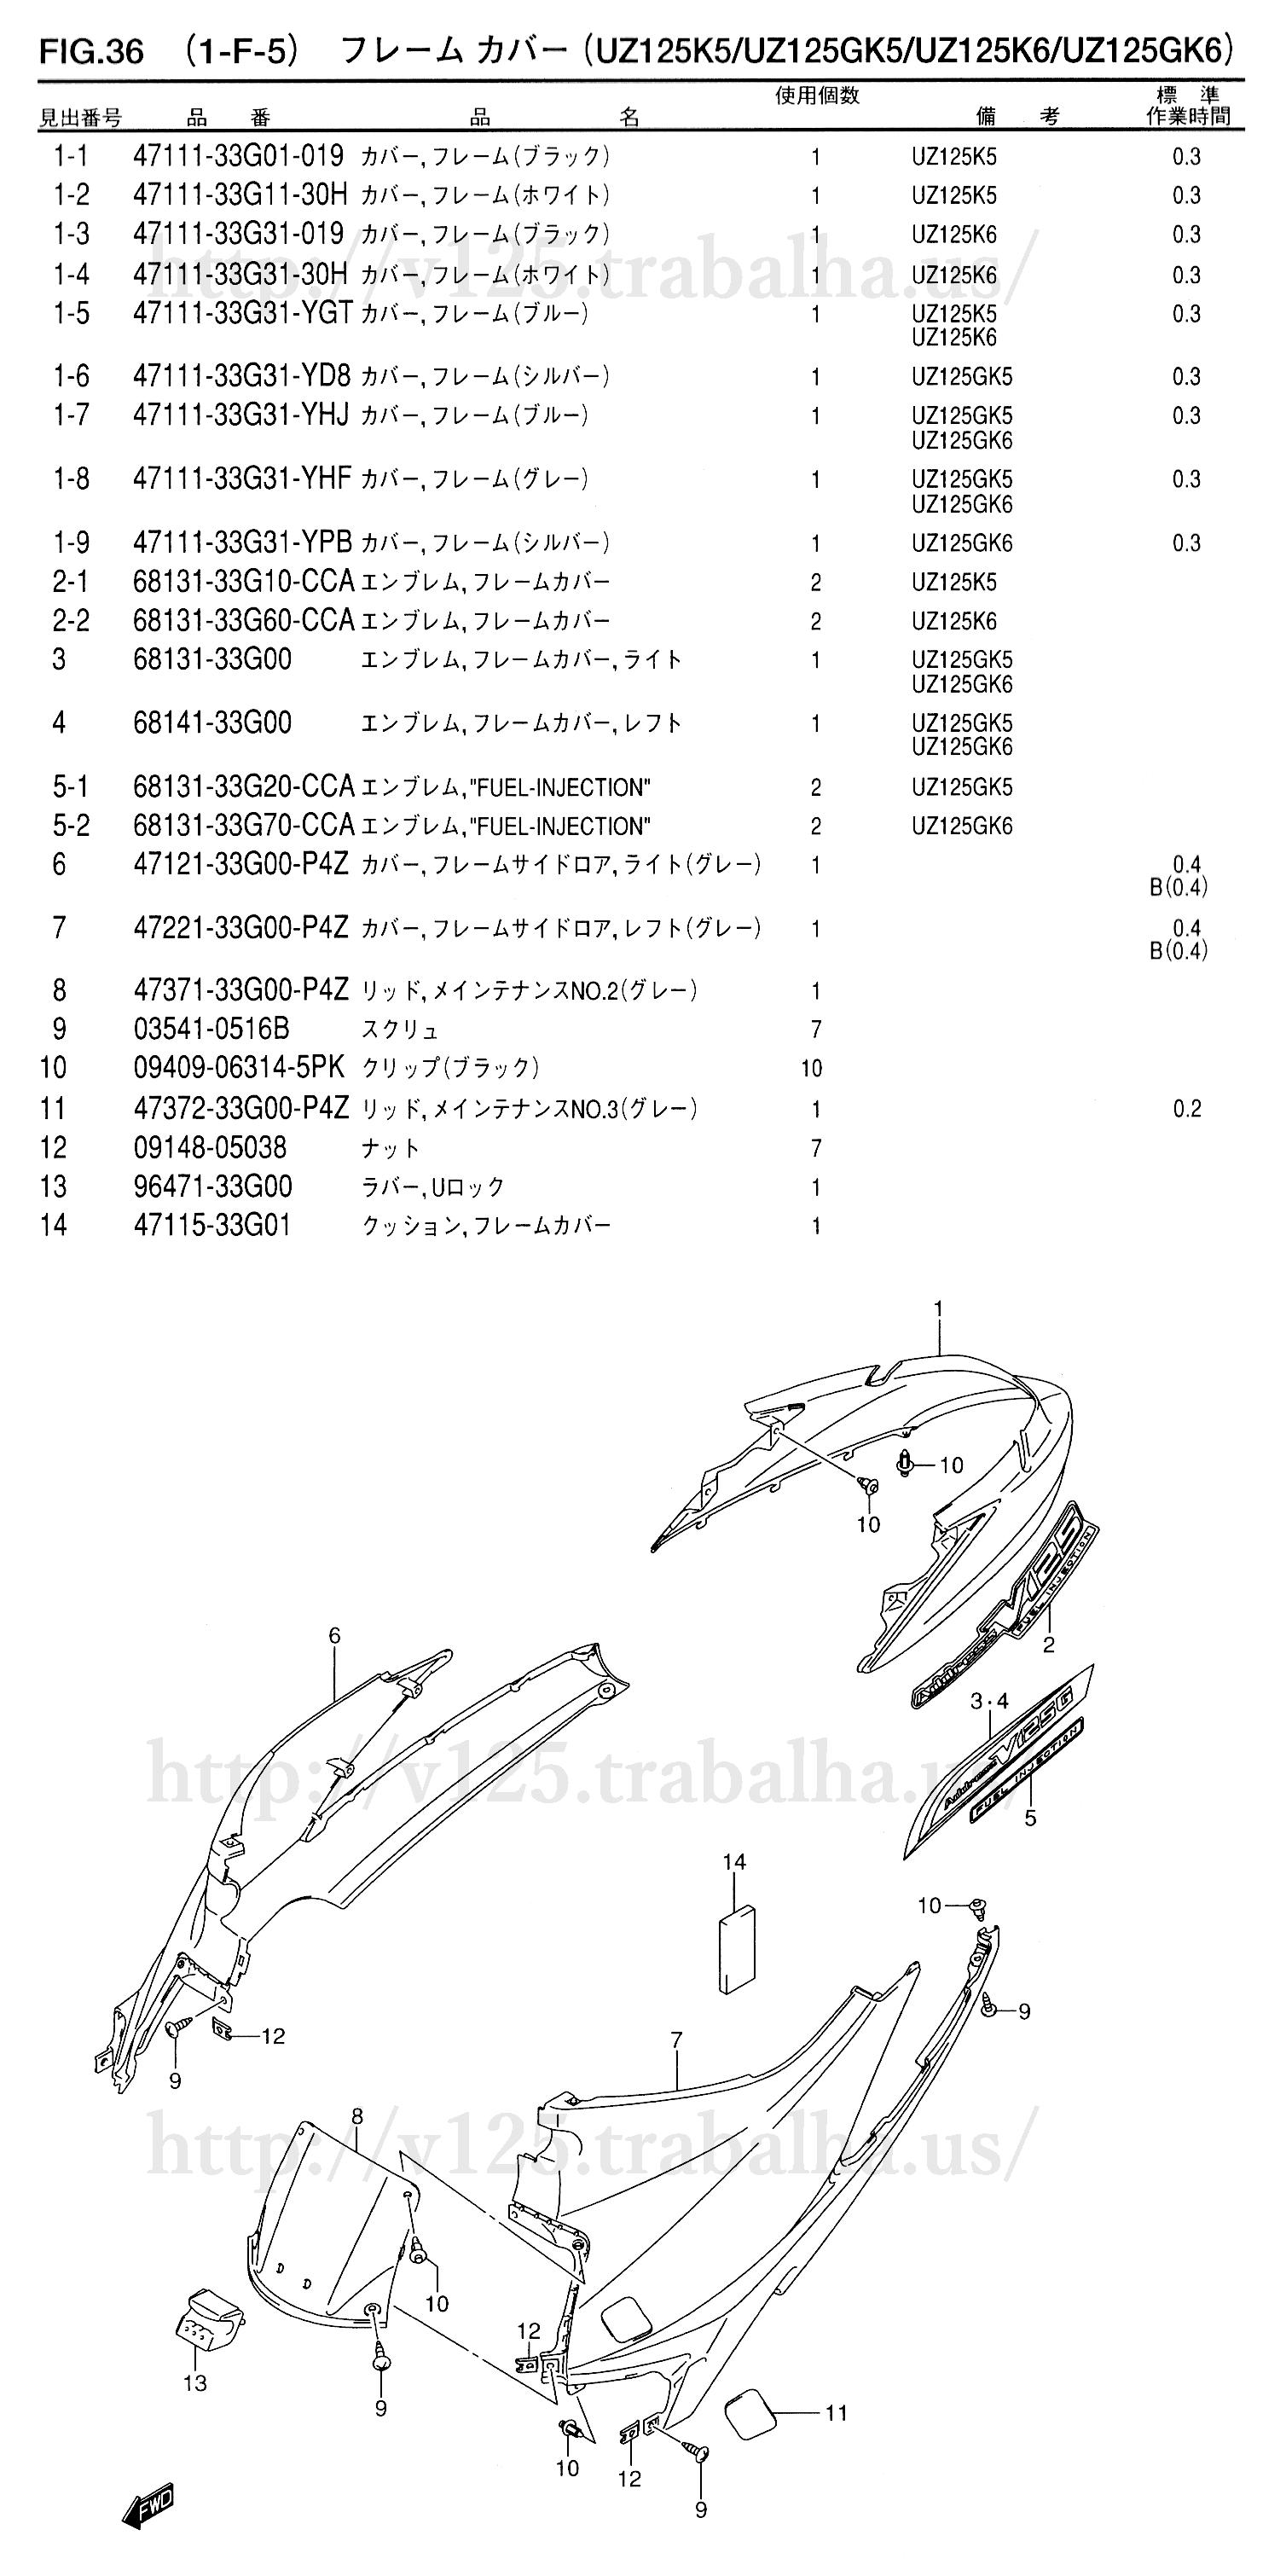 FIG.36(1-F-5)フレームカバー(UZ125K5/UZ125GK5/UZ125K6/UZ125GK6)